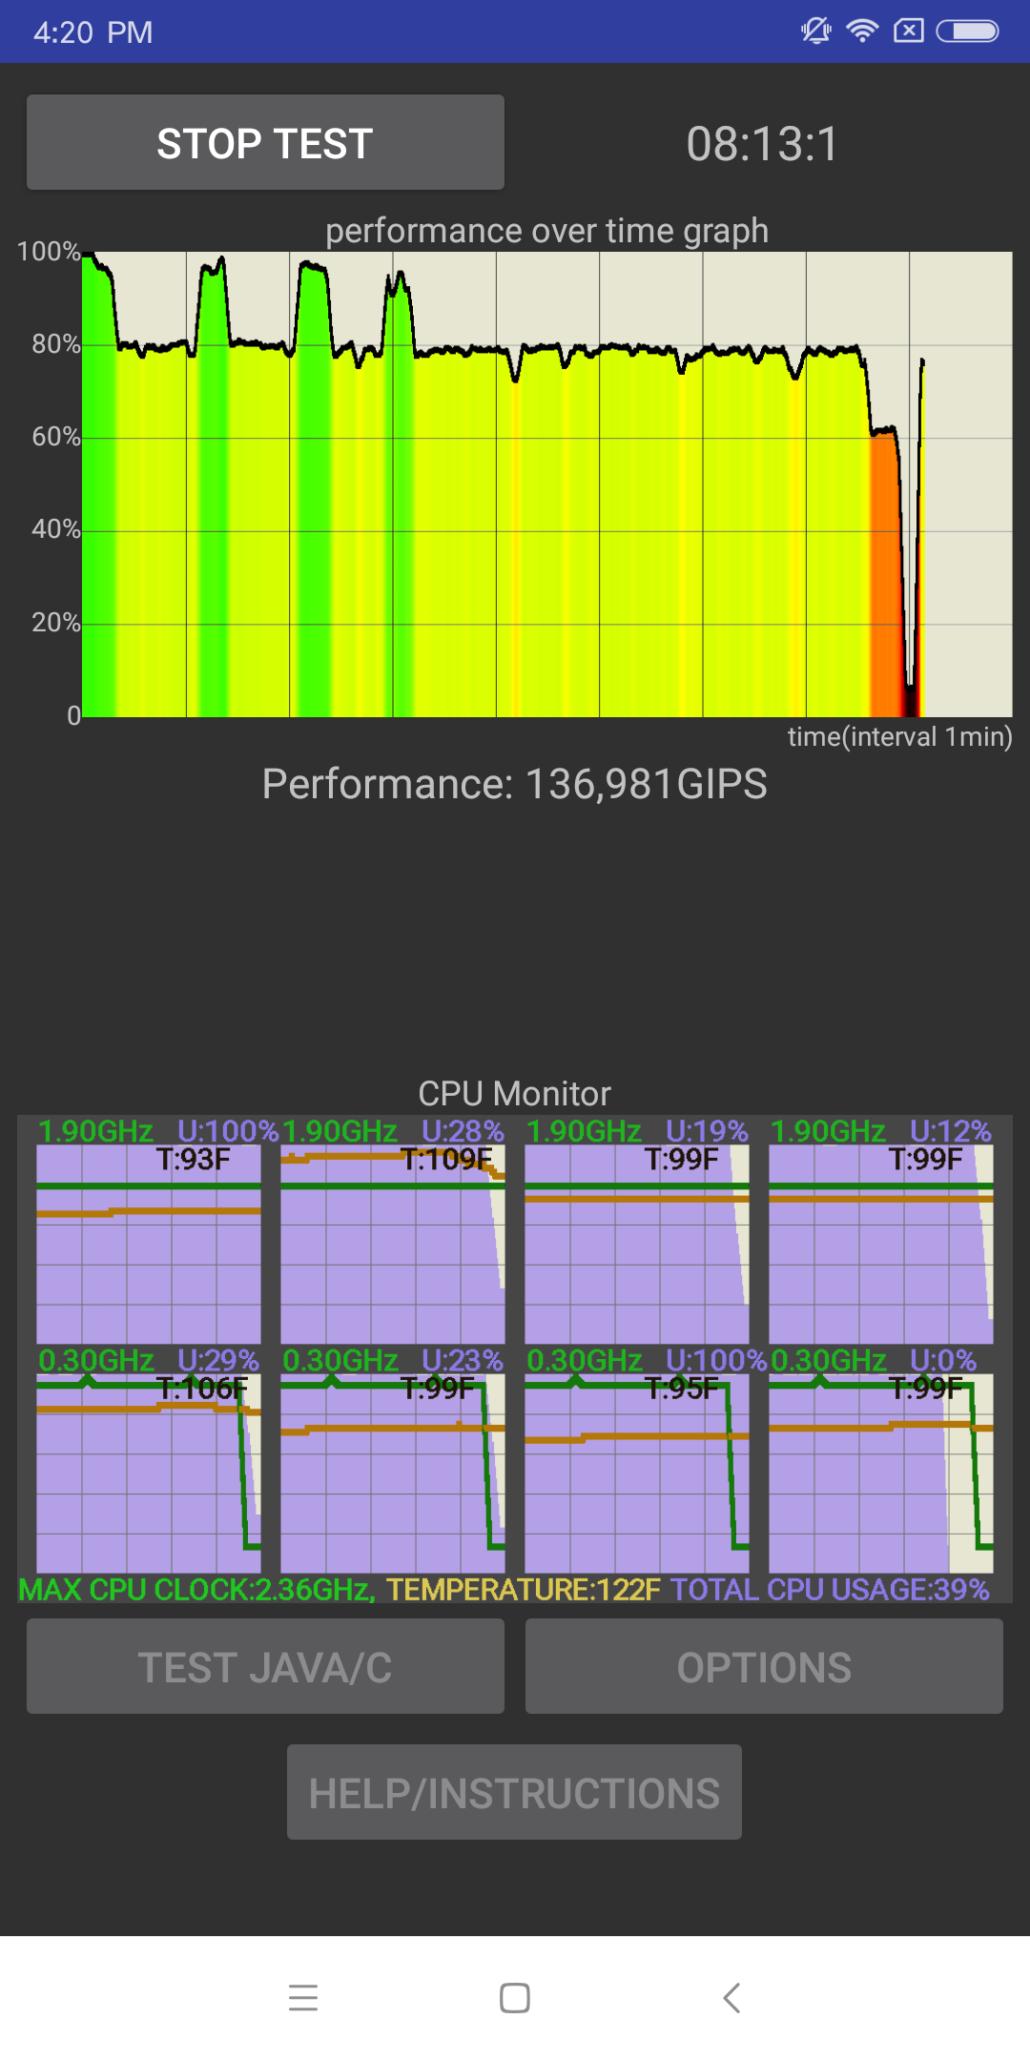 screenshot_2018-01-29-16-20-12-915_skynet-cputhrottlingtest